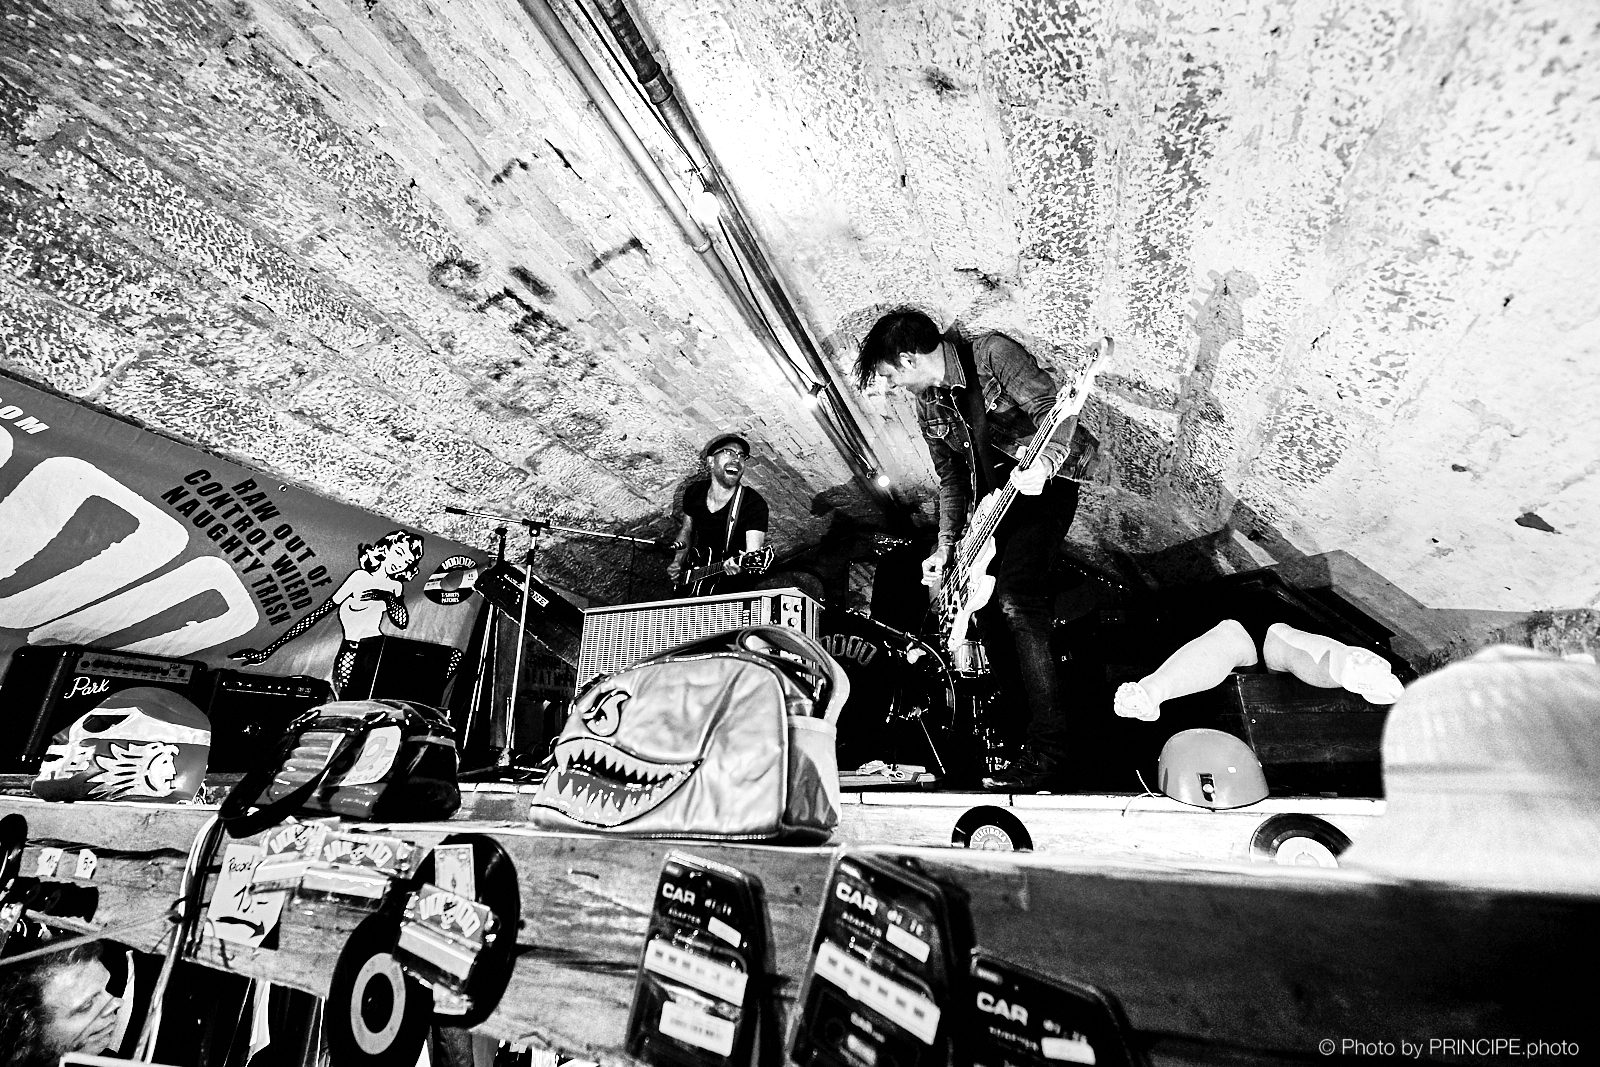 E.T. Explore Me @ The Voodoo Rhythm & Pantichrist Hardware Store